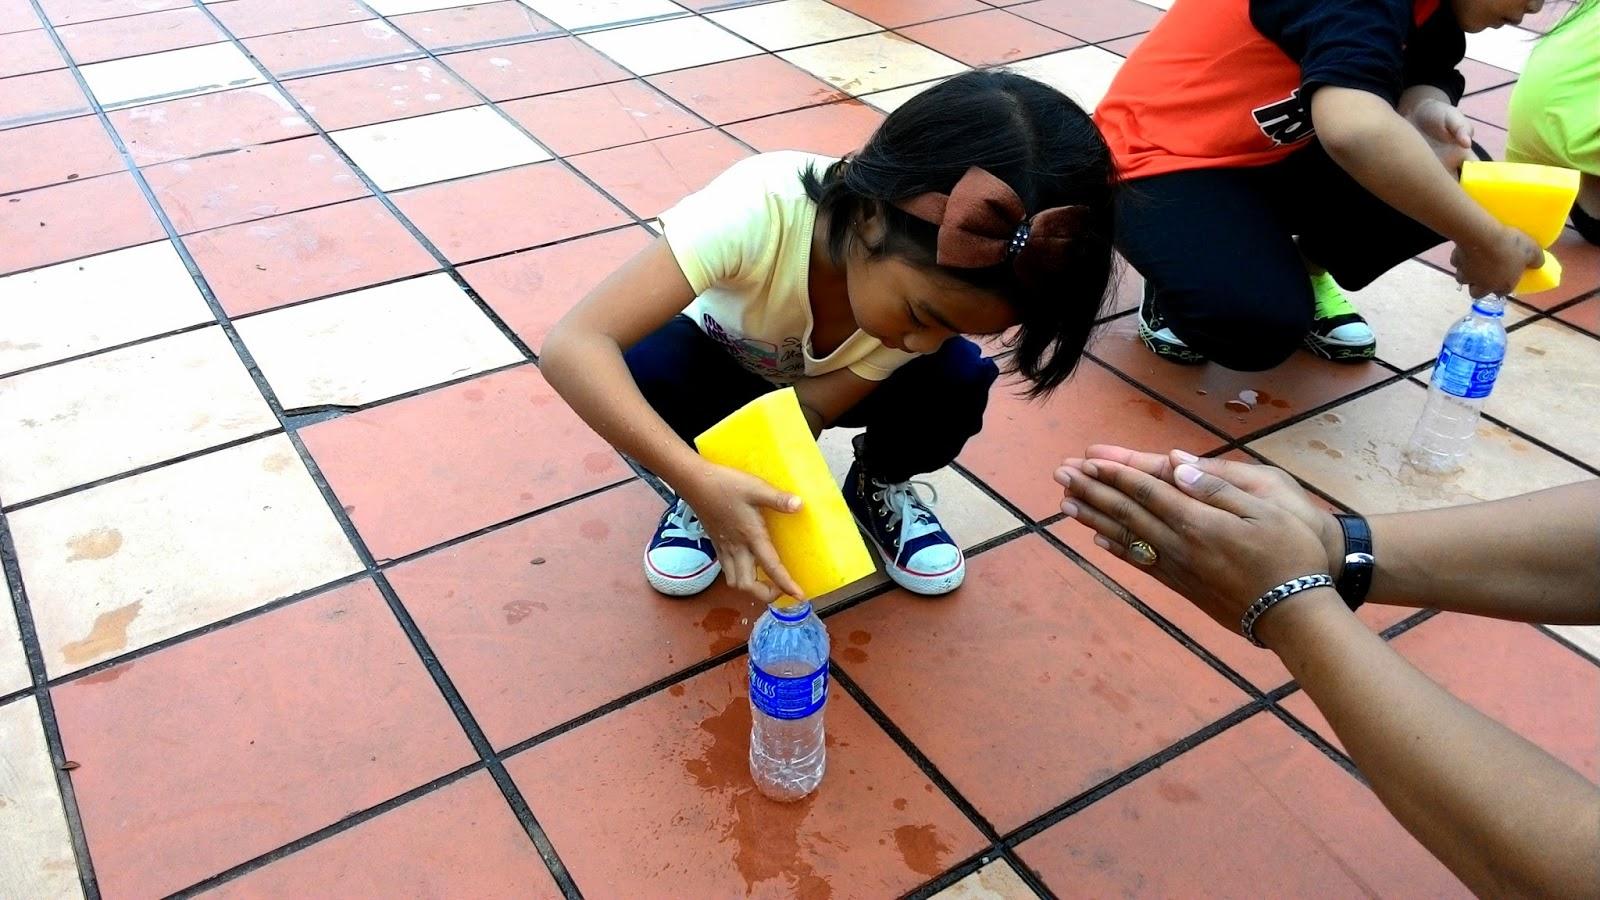 Acara masuk air dalam botol, Parol KL